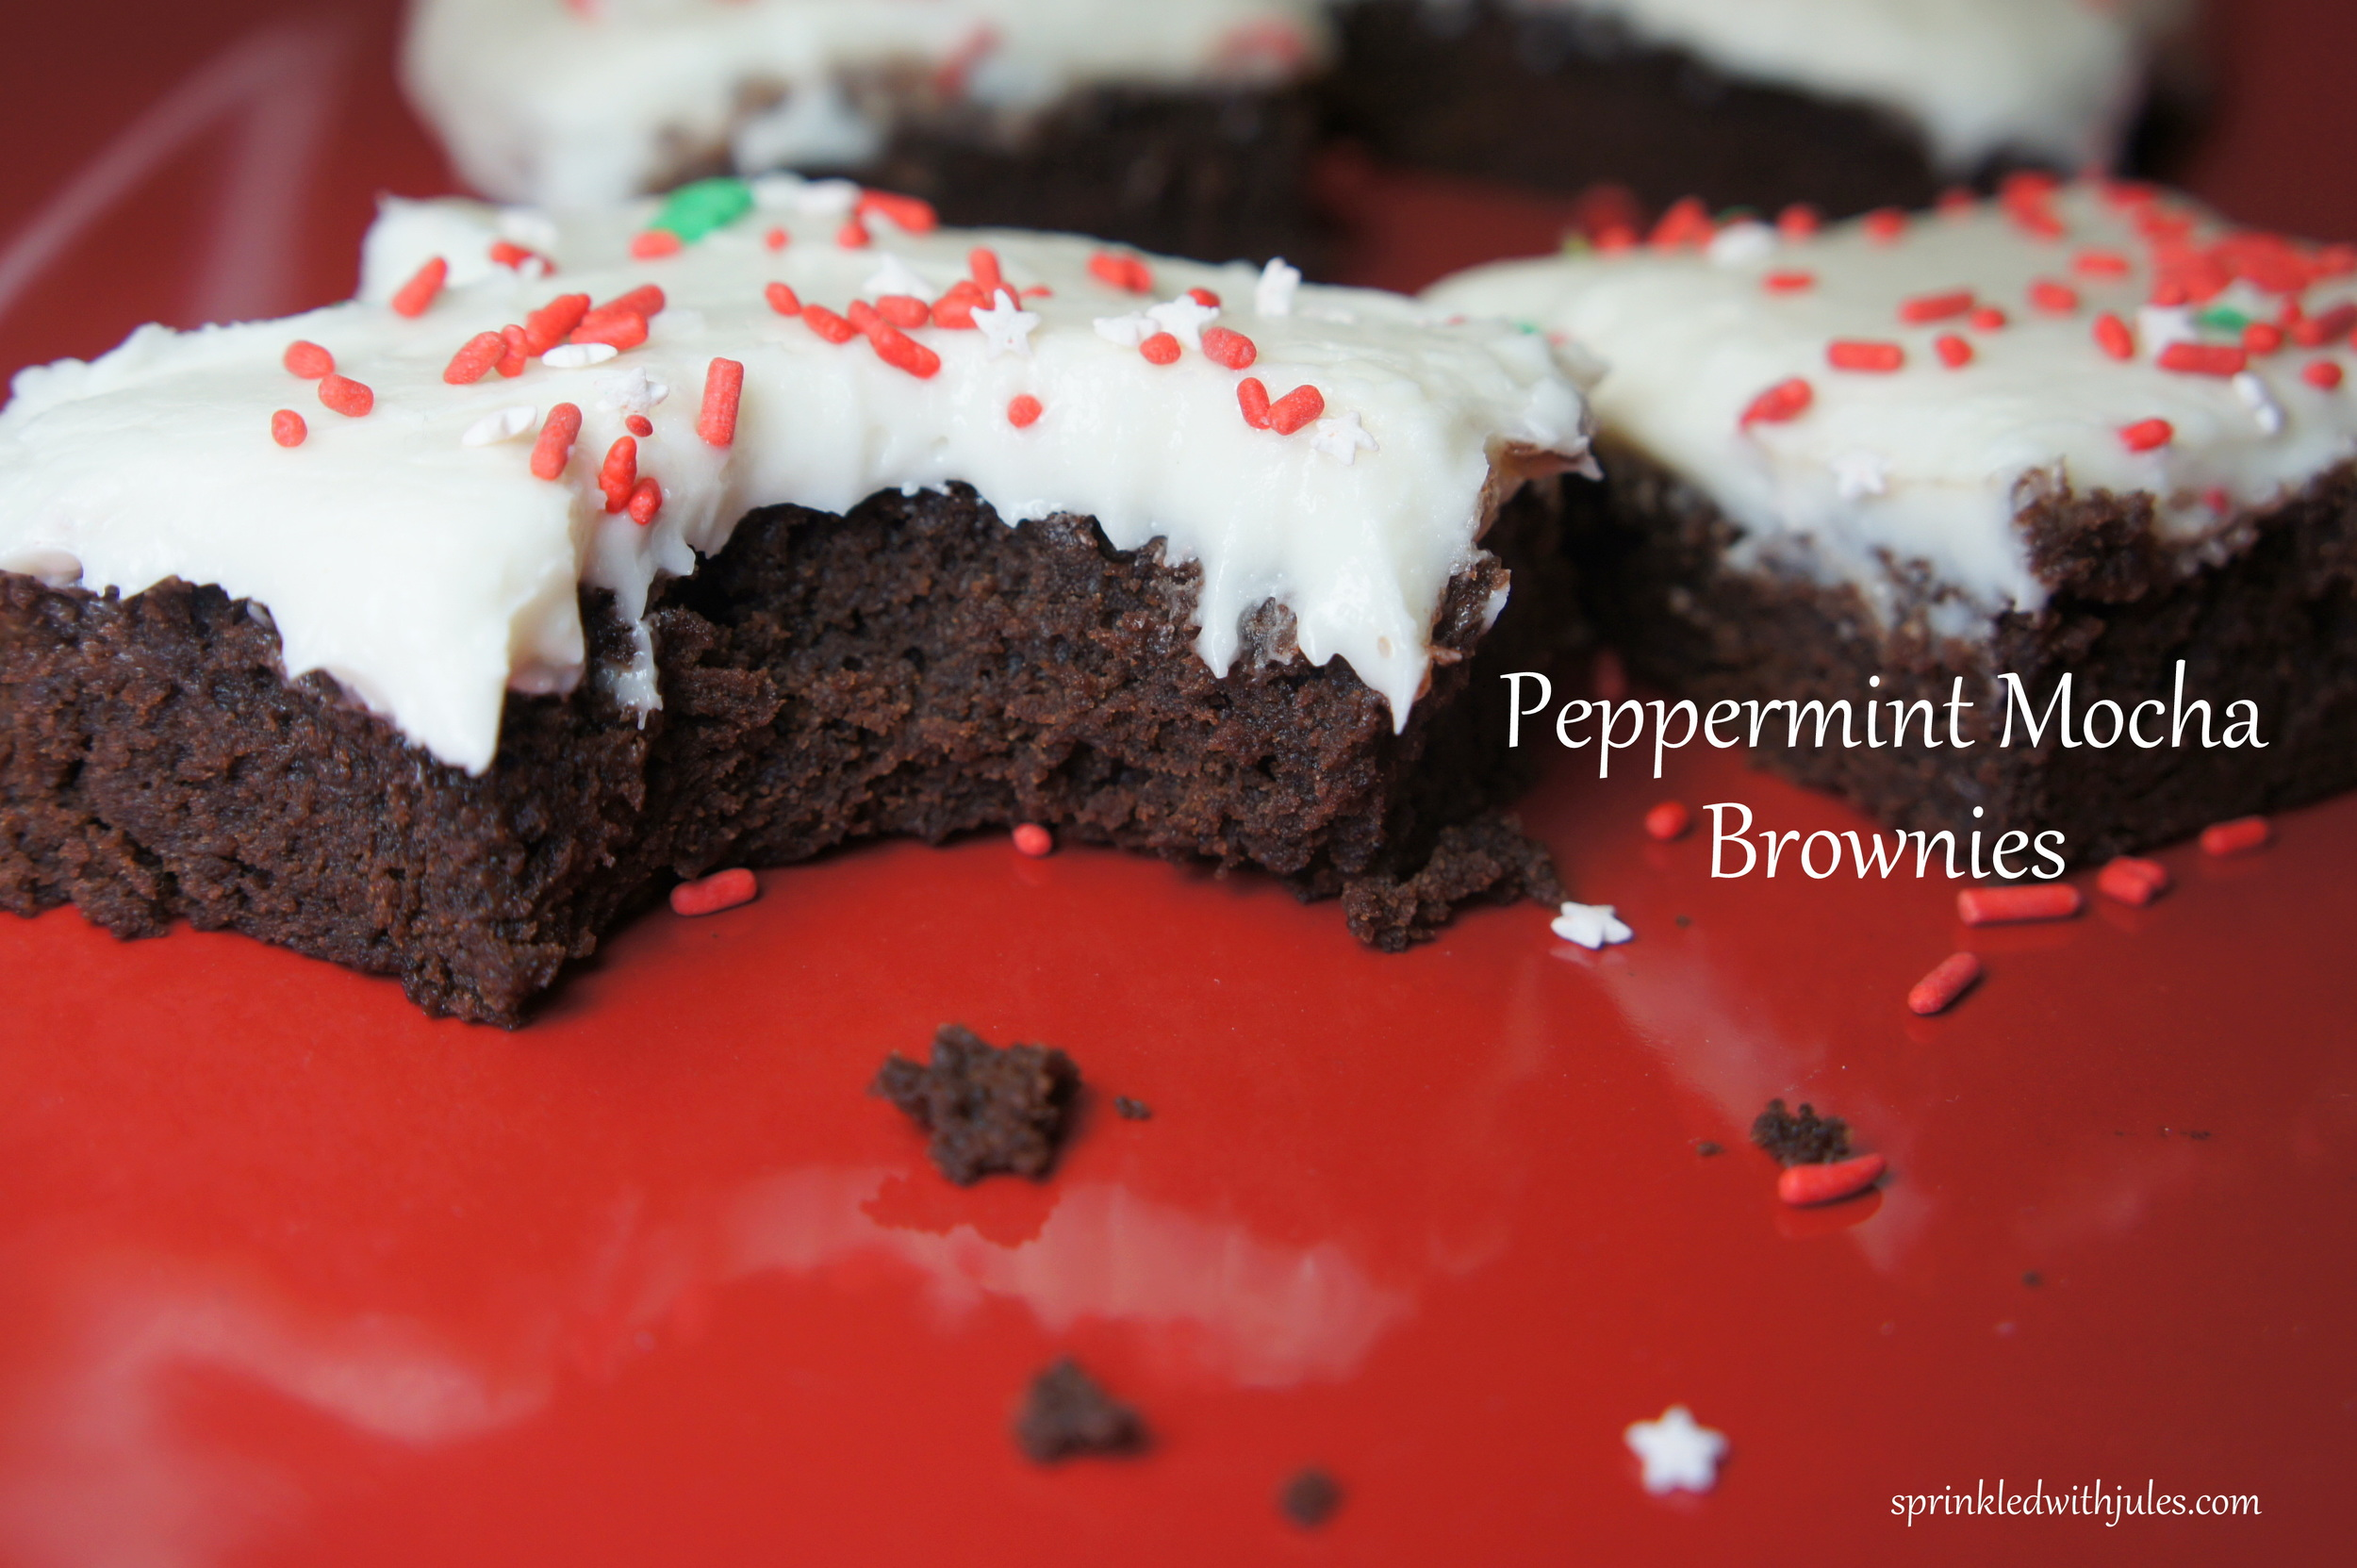 Peppermint Mocha Brownies